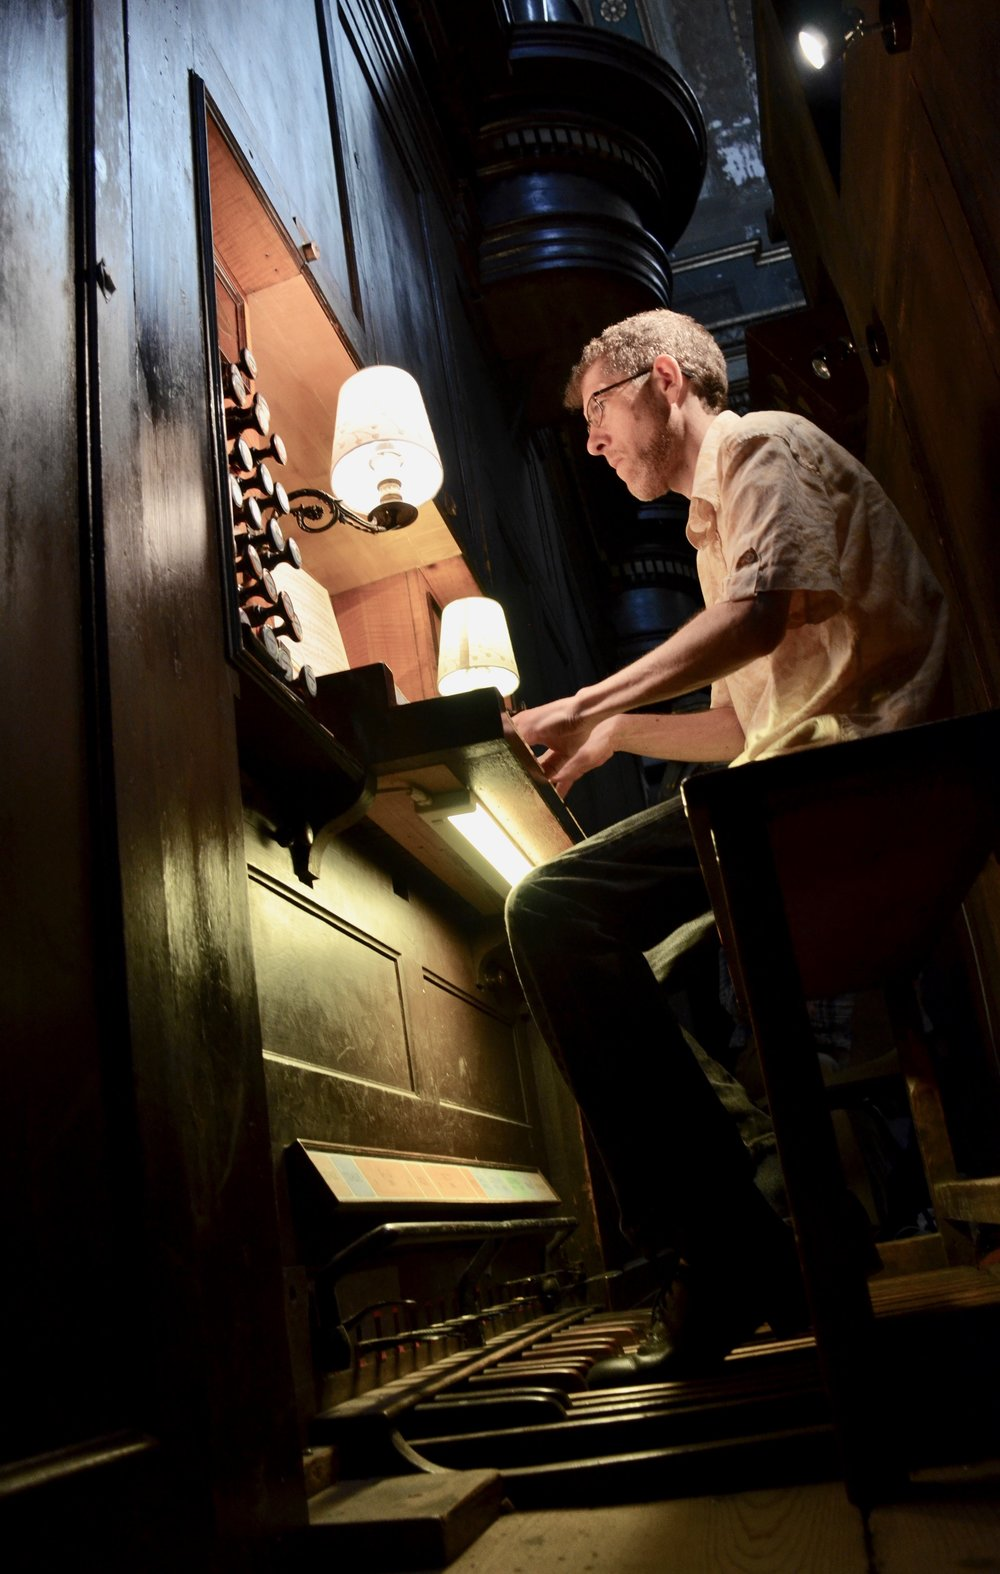 Chris Porter plays the organ in Notre Dame la Daurade, Toulouse